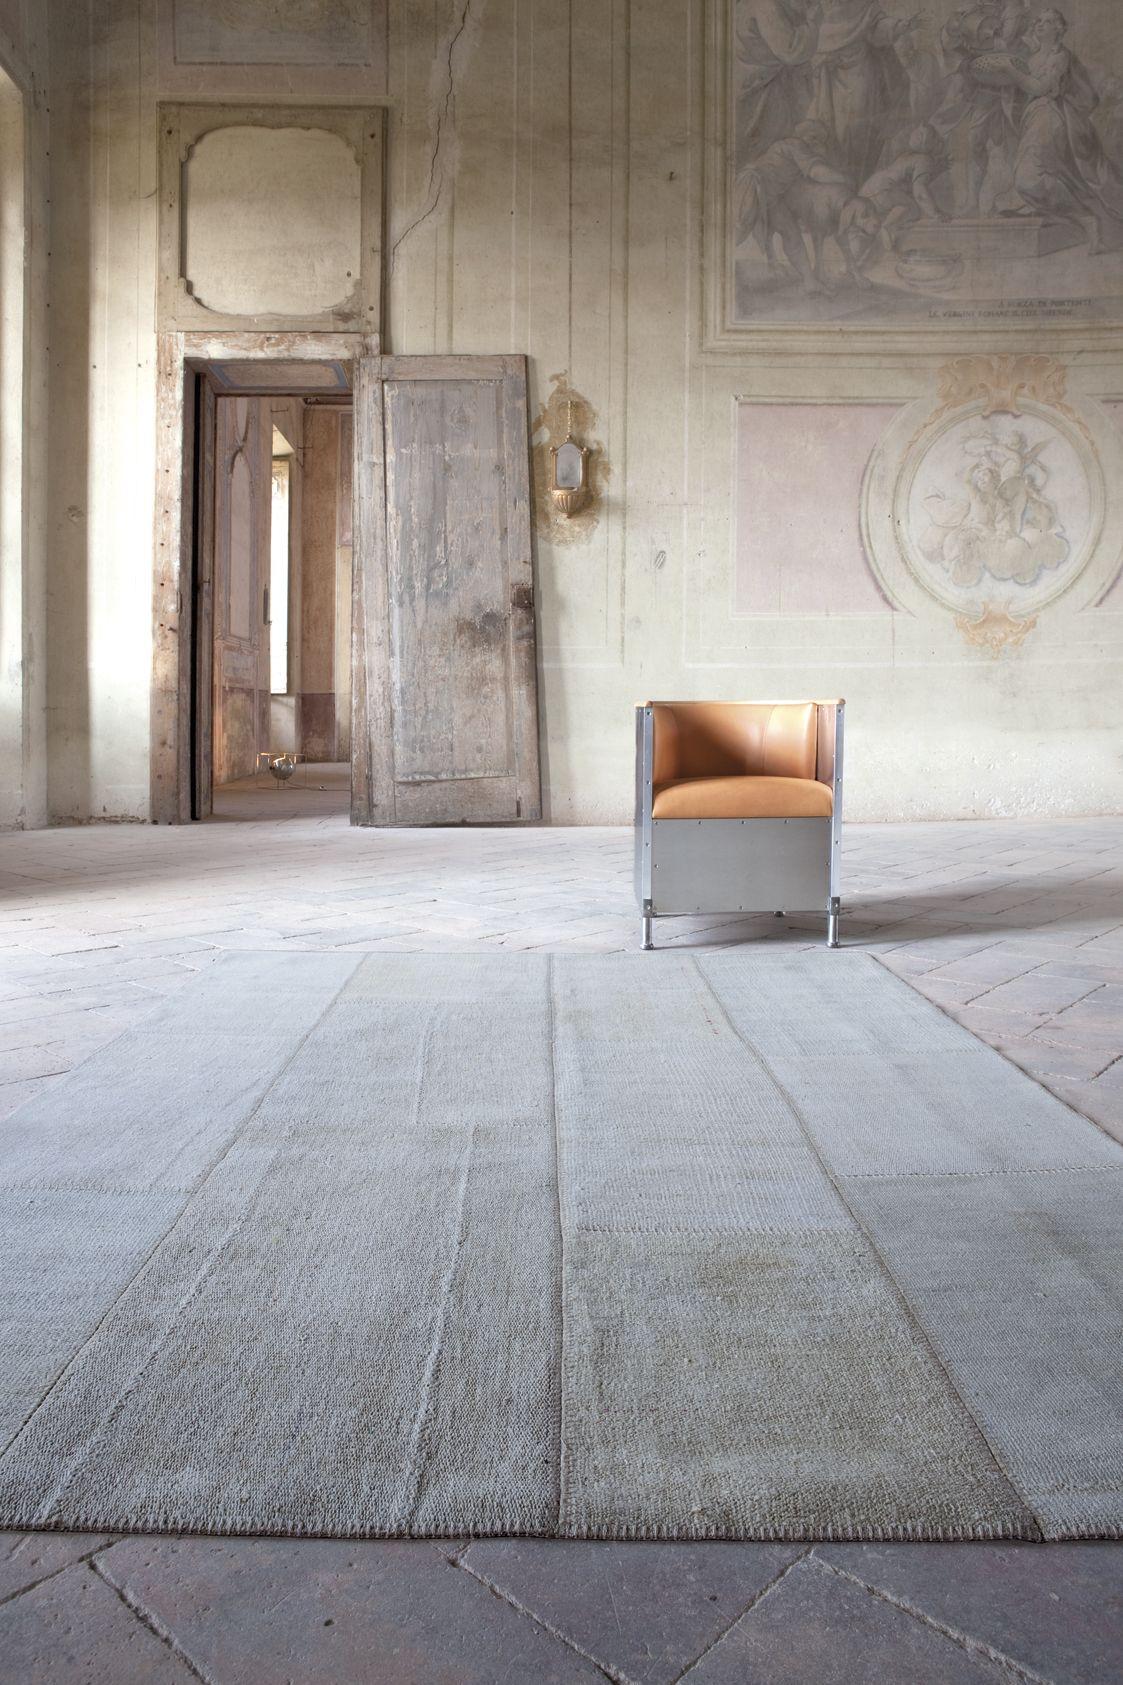 Kinnasand HEMP CARPET | Just Haasnoot loves | Pinterest - Interieur ...